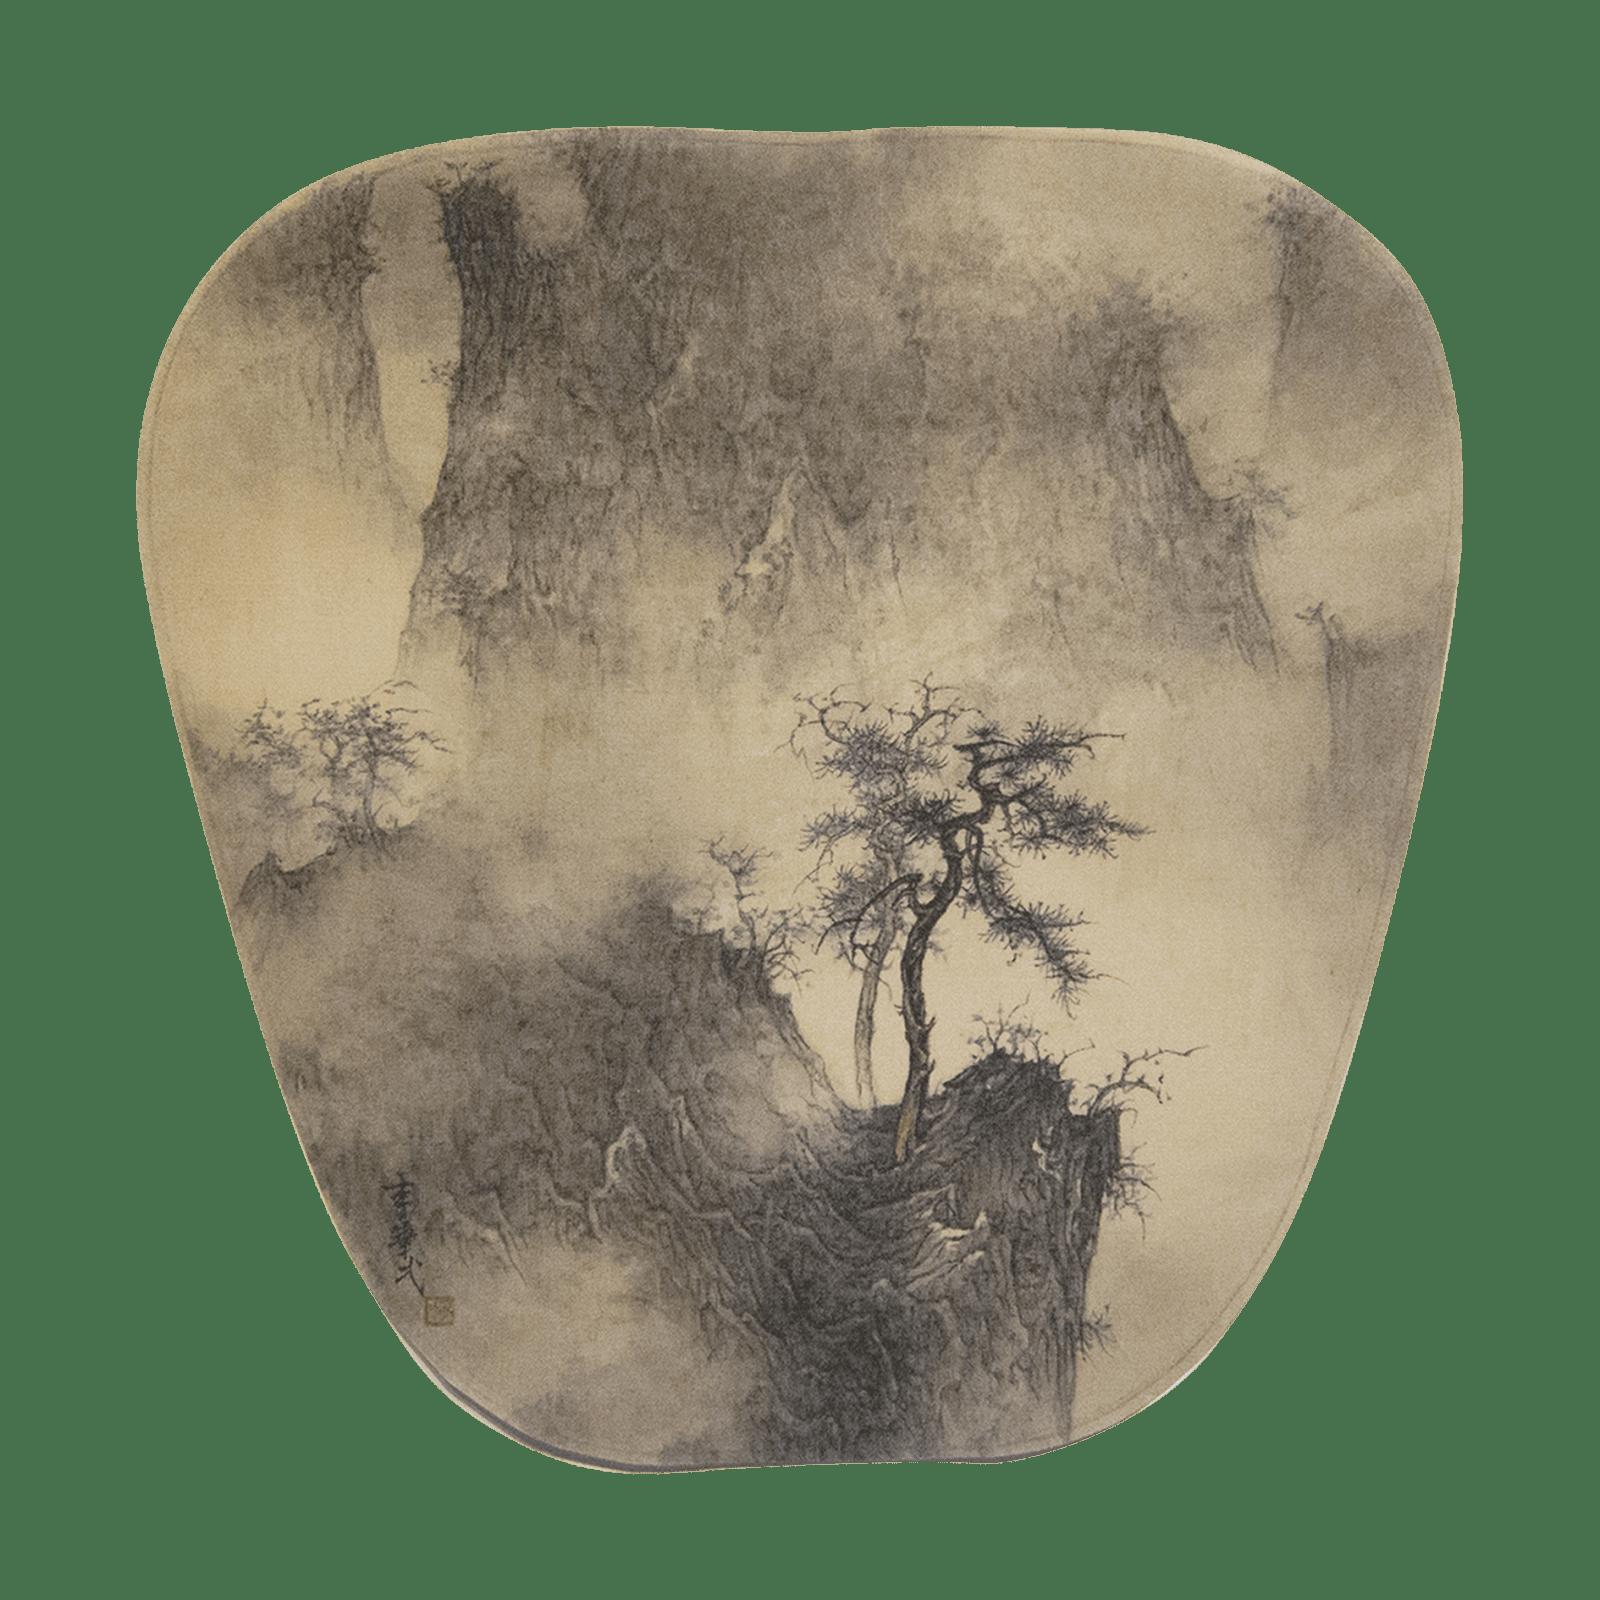 Li Huayi 李華弌, Untitled《無題》, 2015